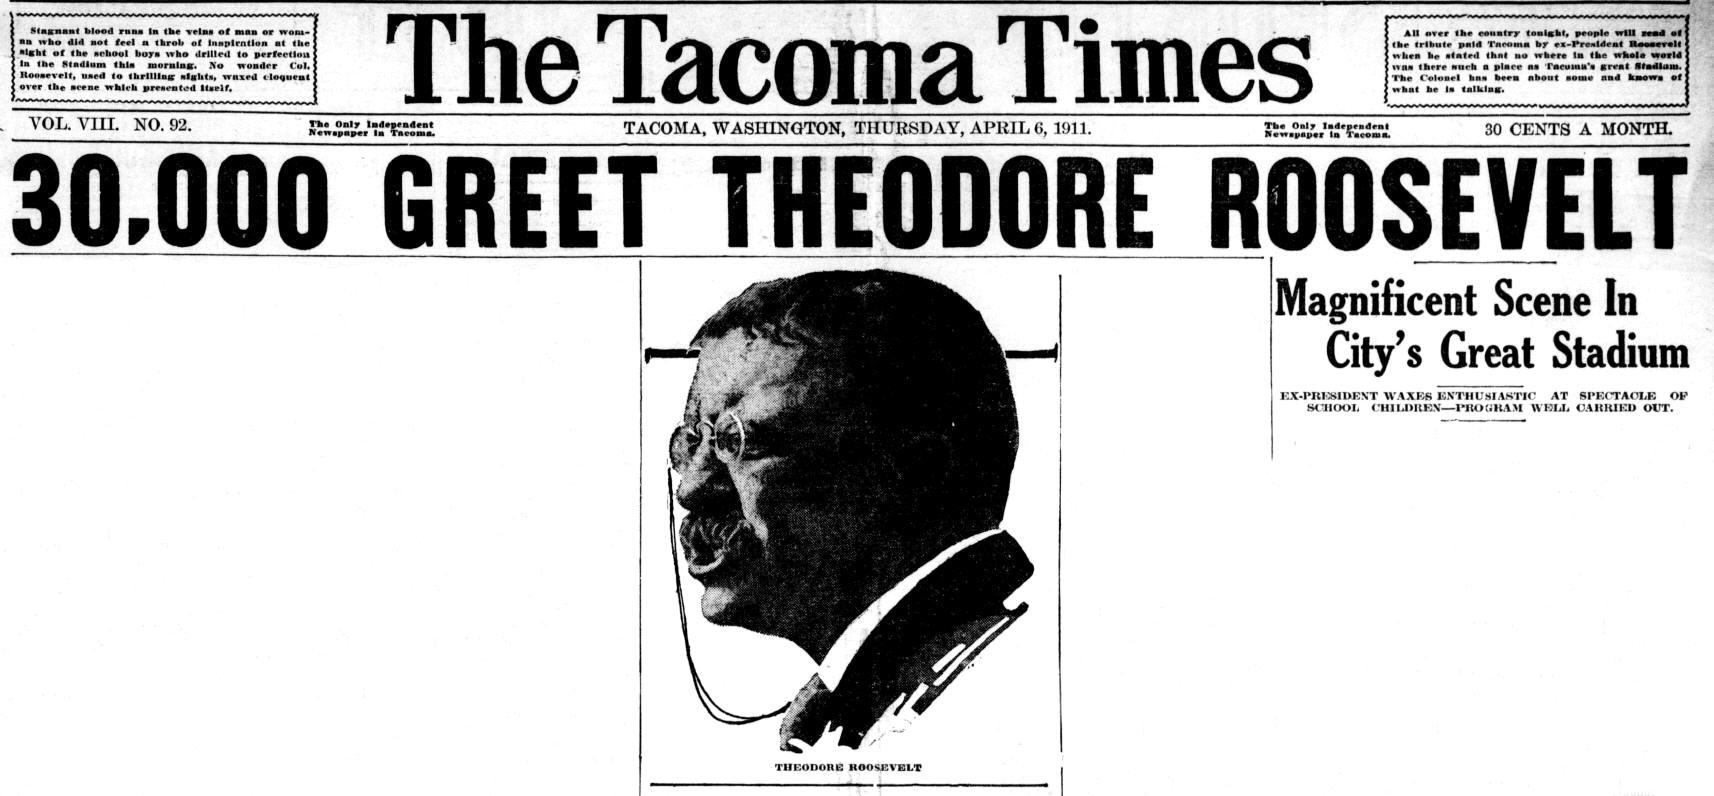 Tacoma Times Oct 4 1913 headline